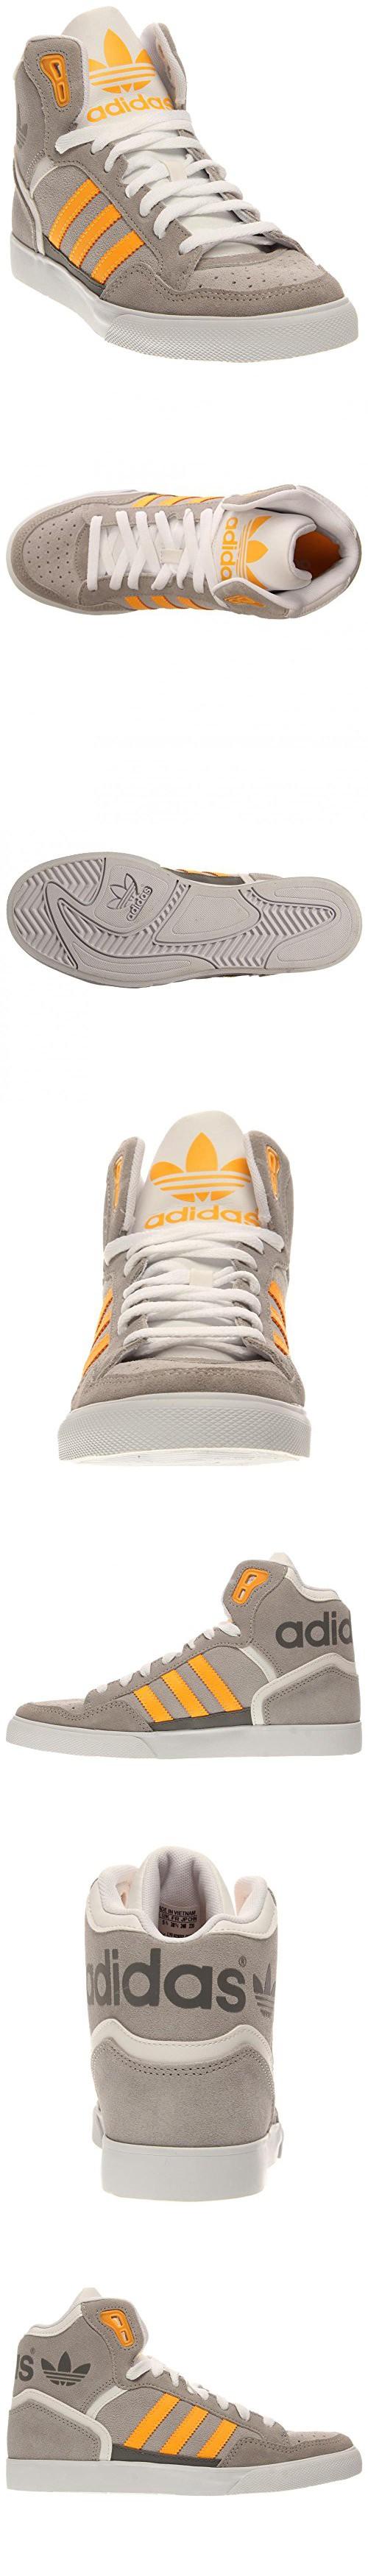 adidas originali delle donne extaball w della scarpa, mgh solid grey